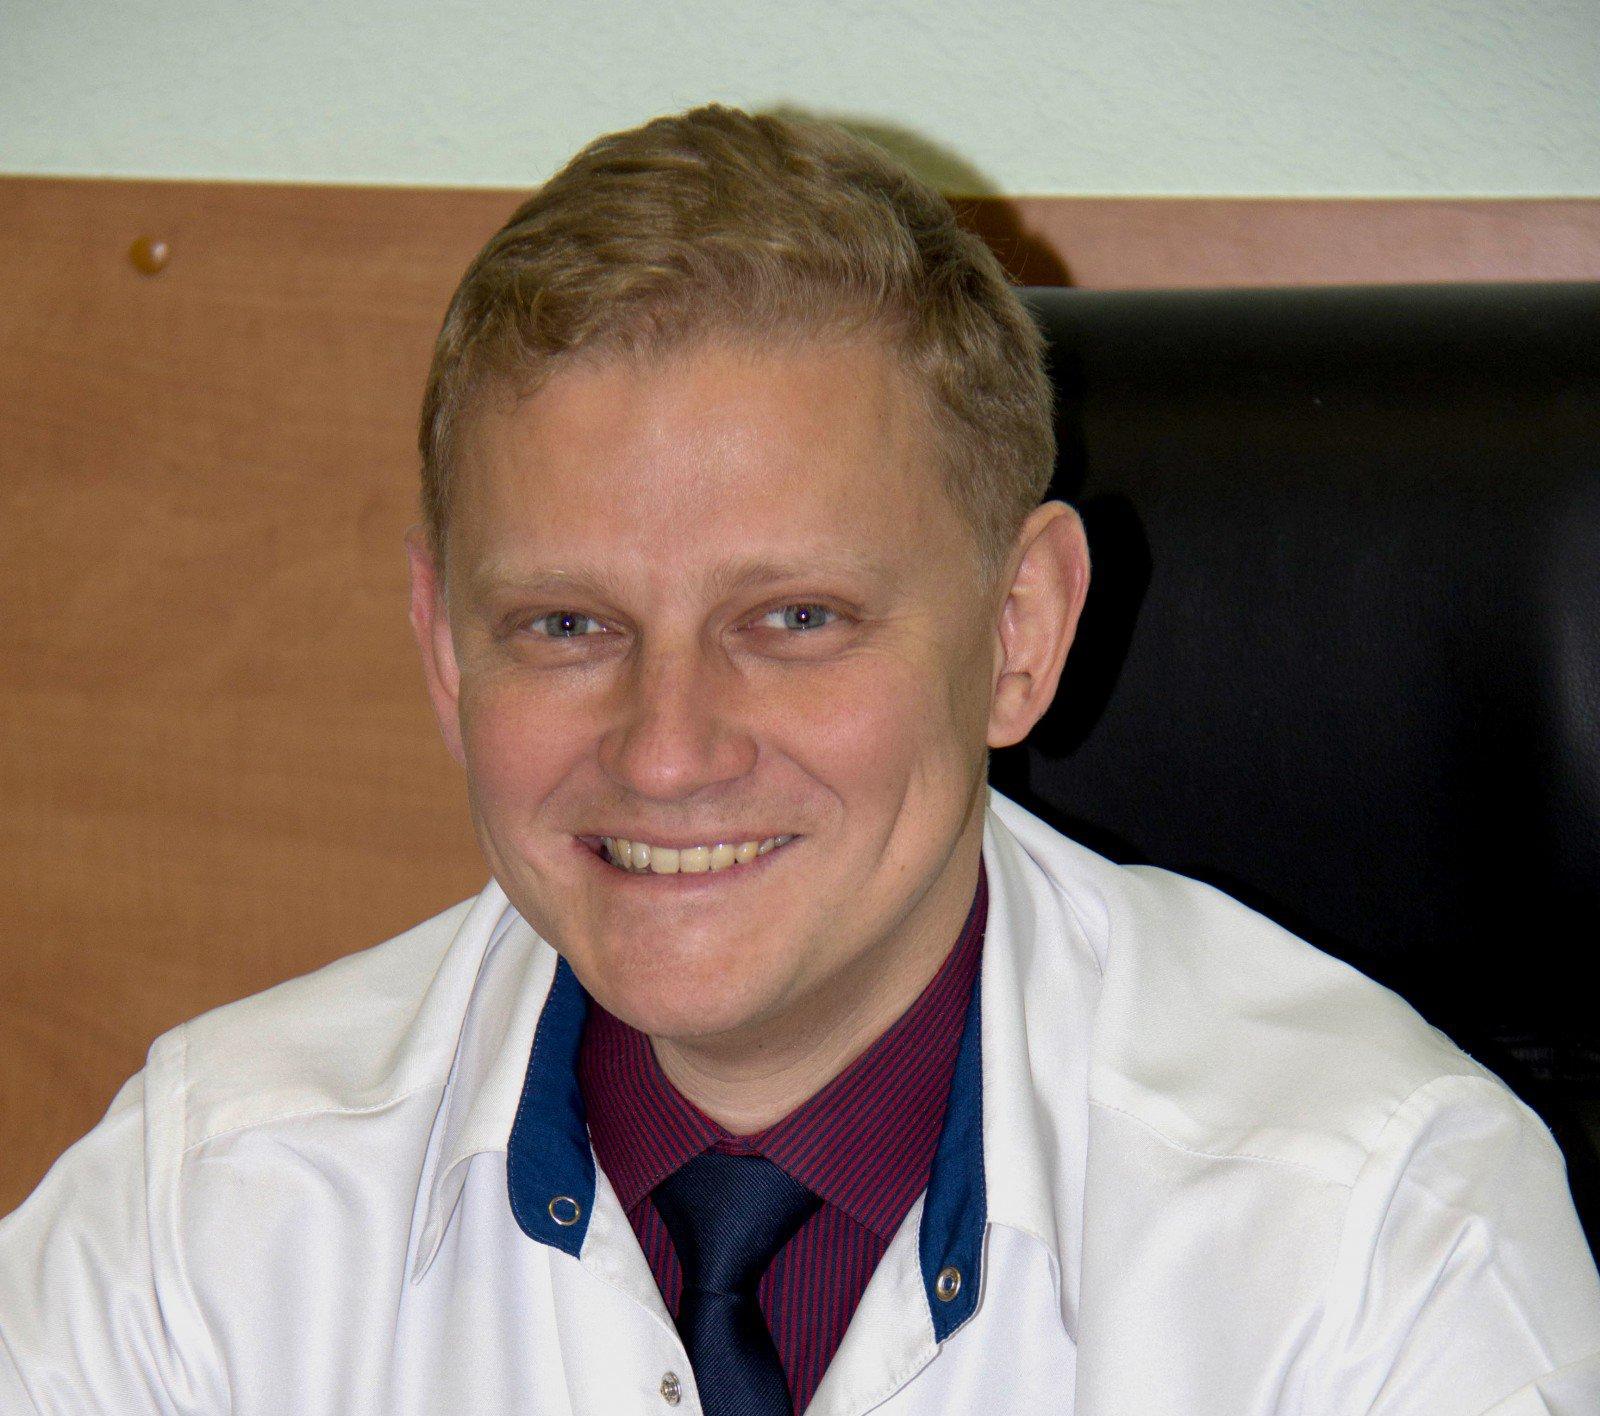 Балдин Александр Владимирович